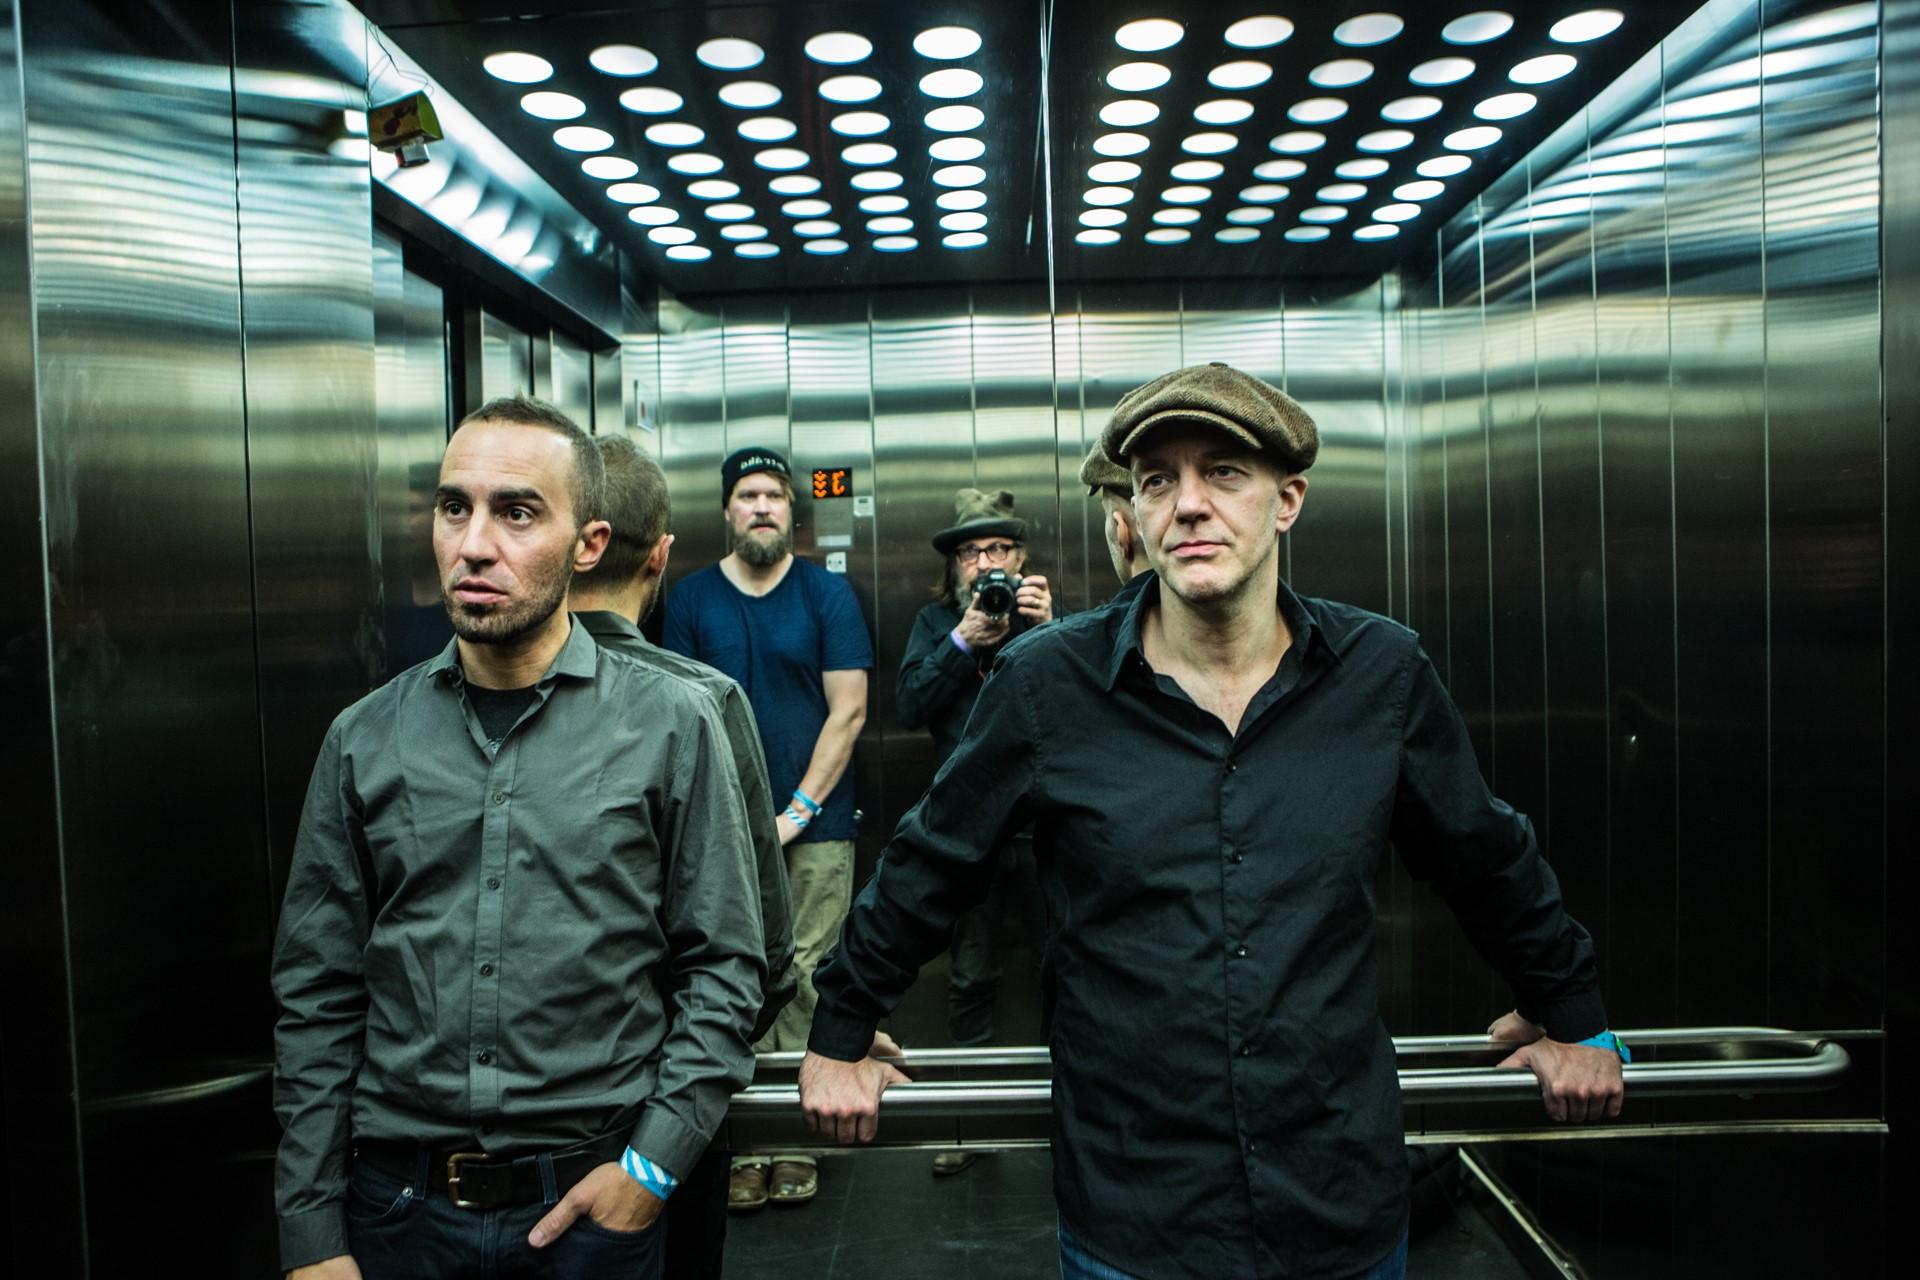 John Grant band in elevator at Harpa concert hall